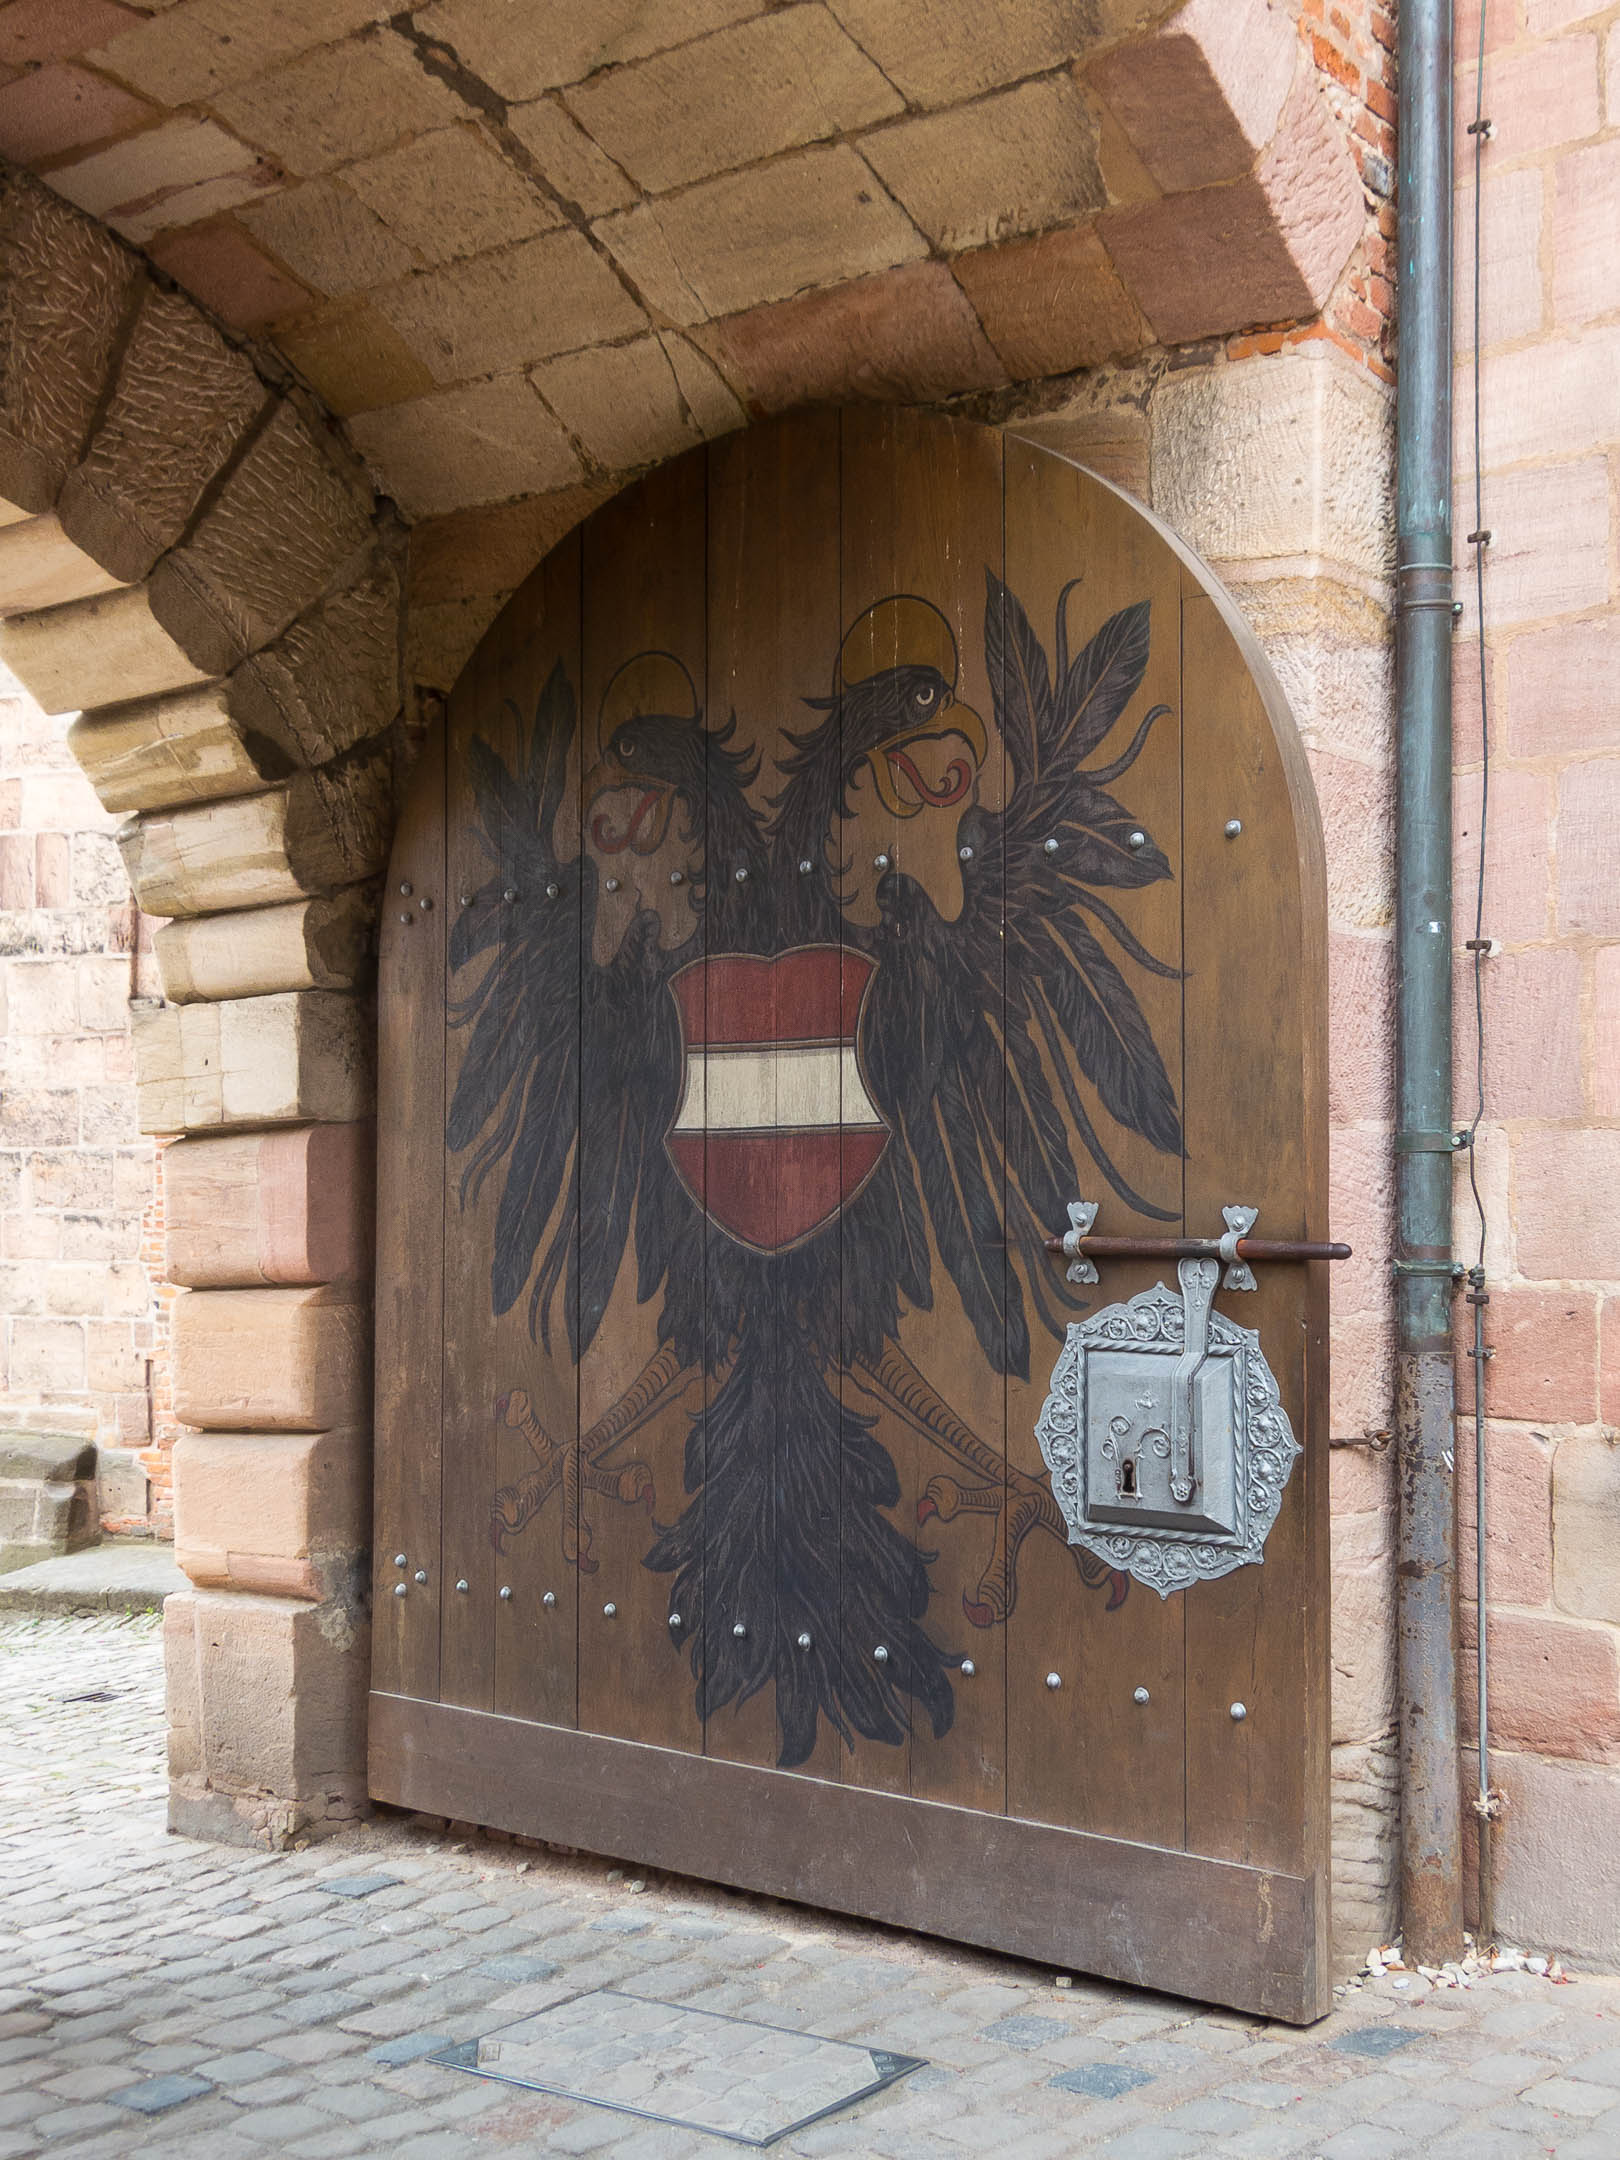 Hinter Schloss und Riegel